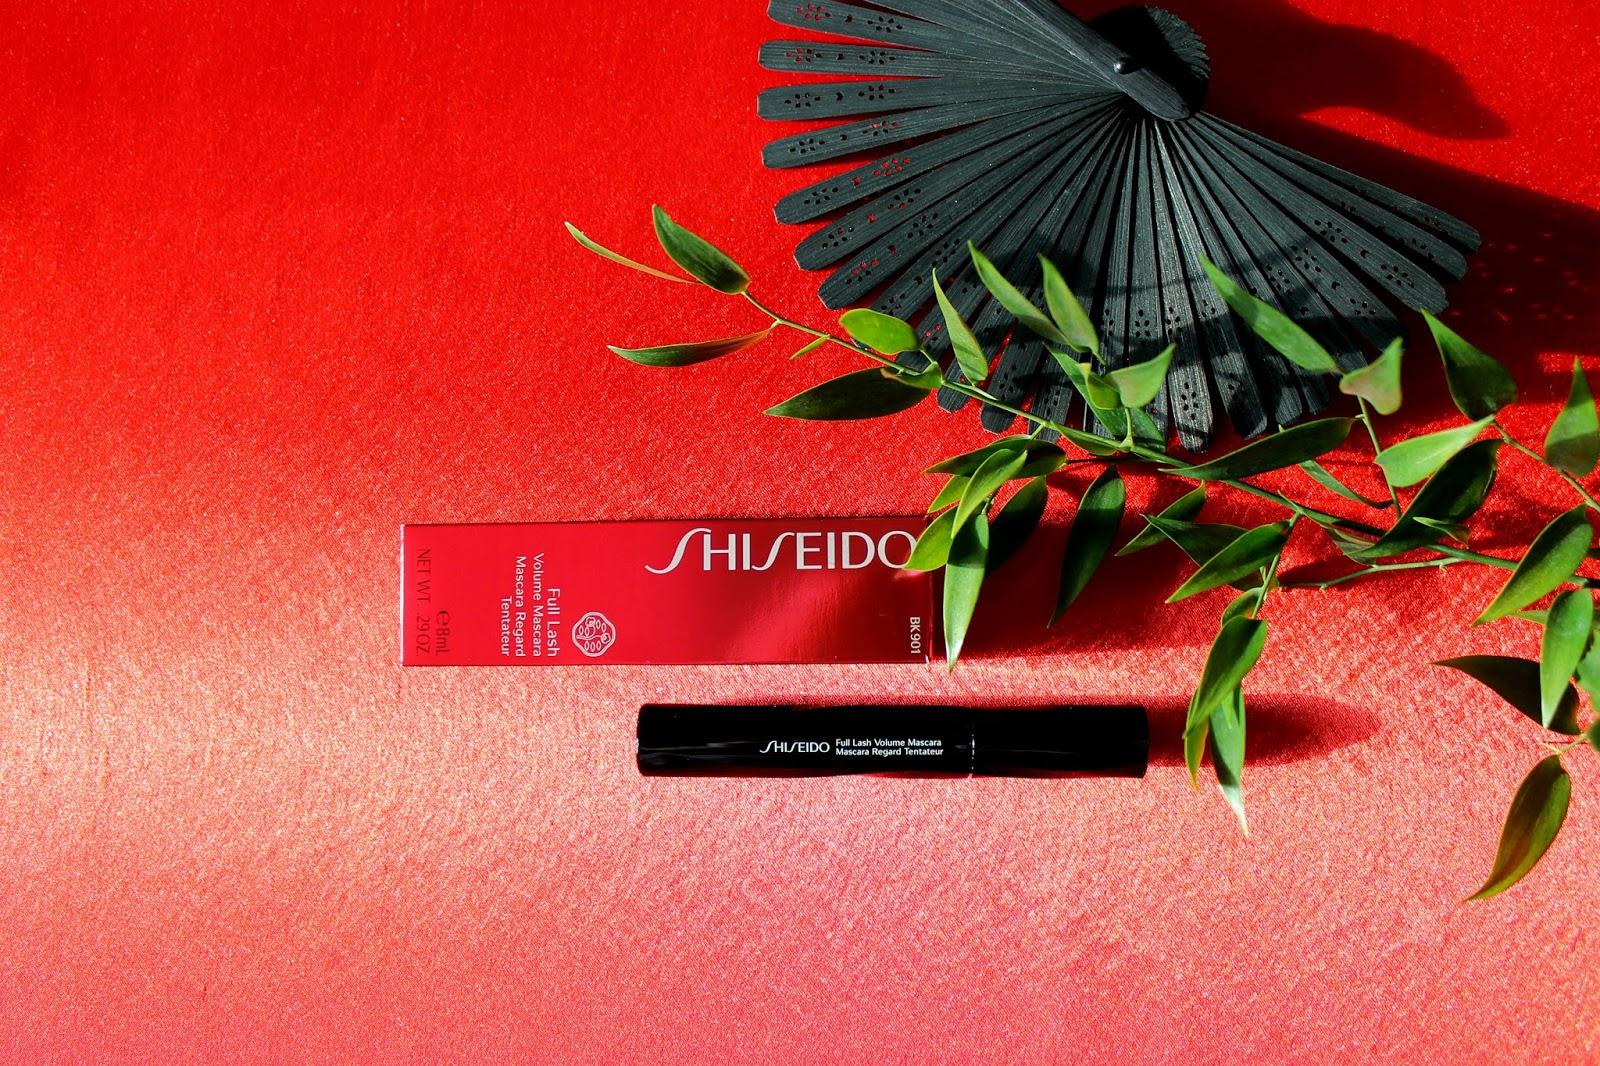 Beauty Unearthly: Shiseido Full Lash Volume Mascara BK 901 ...